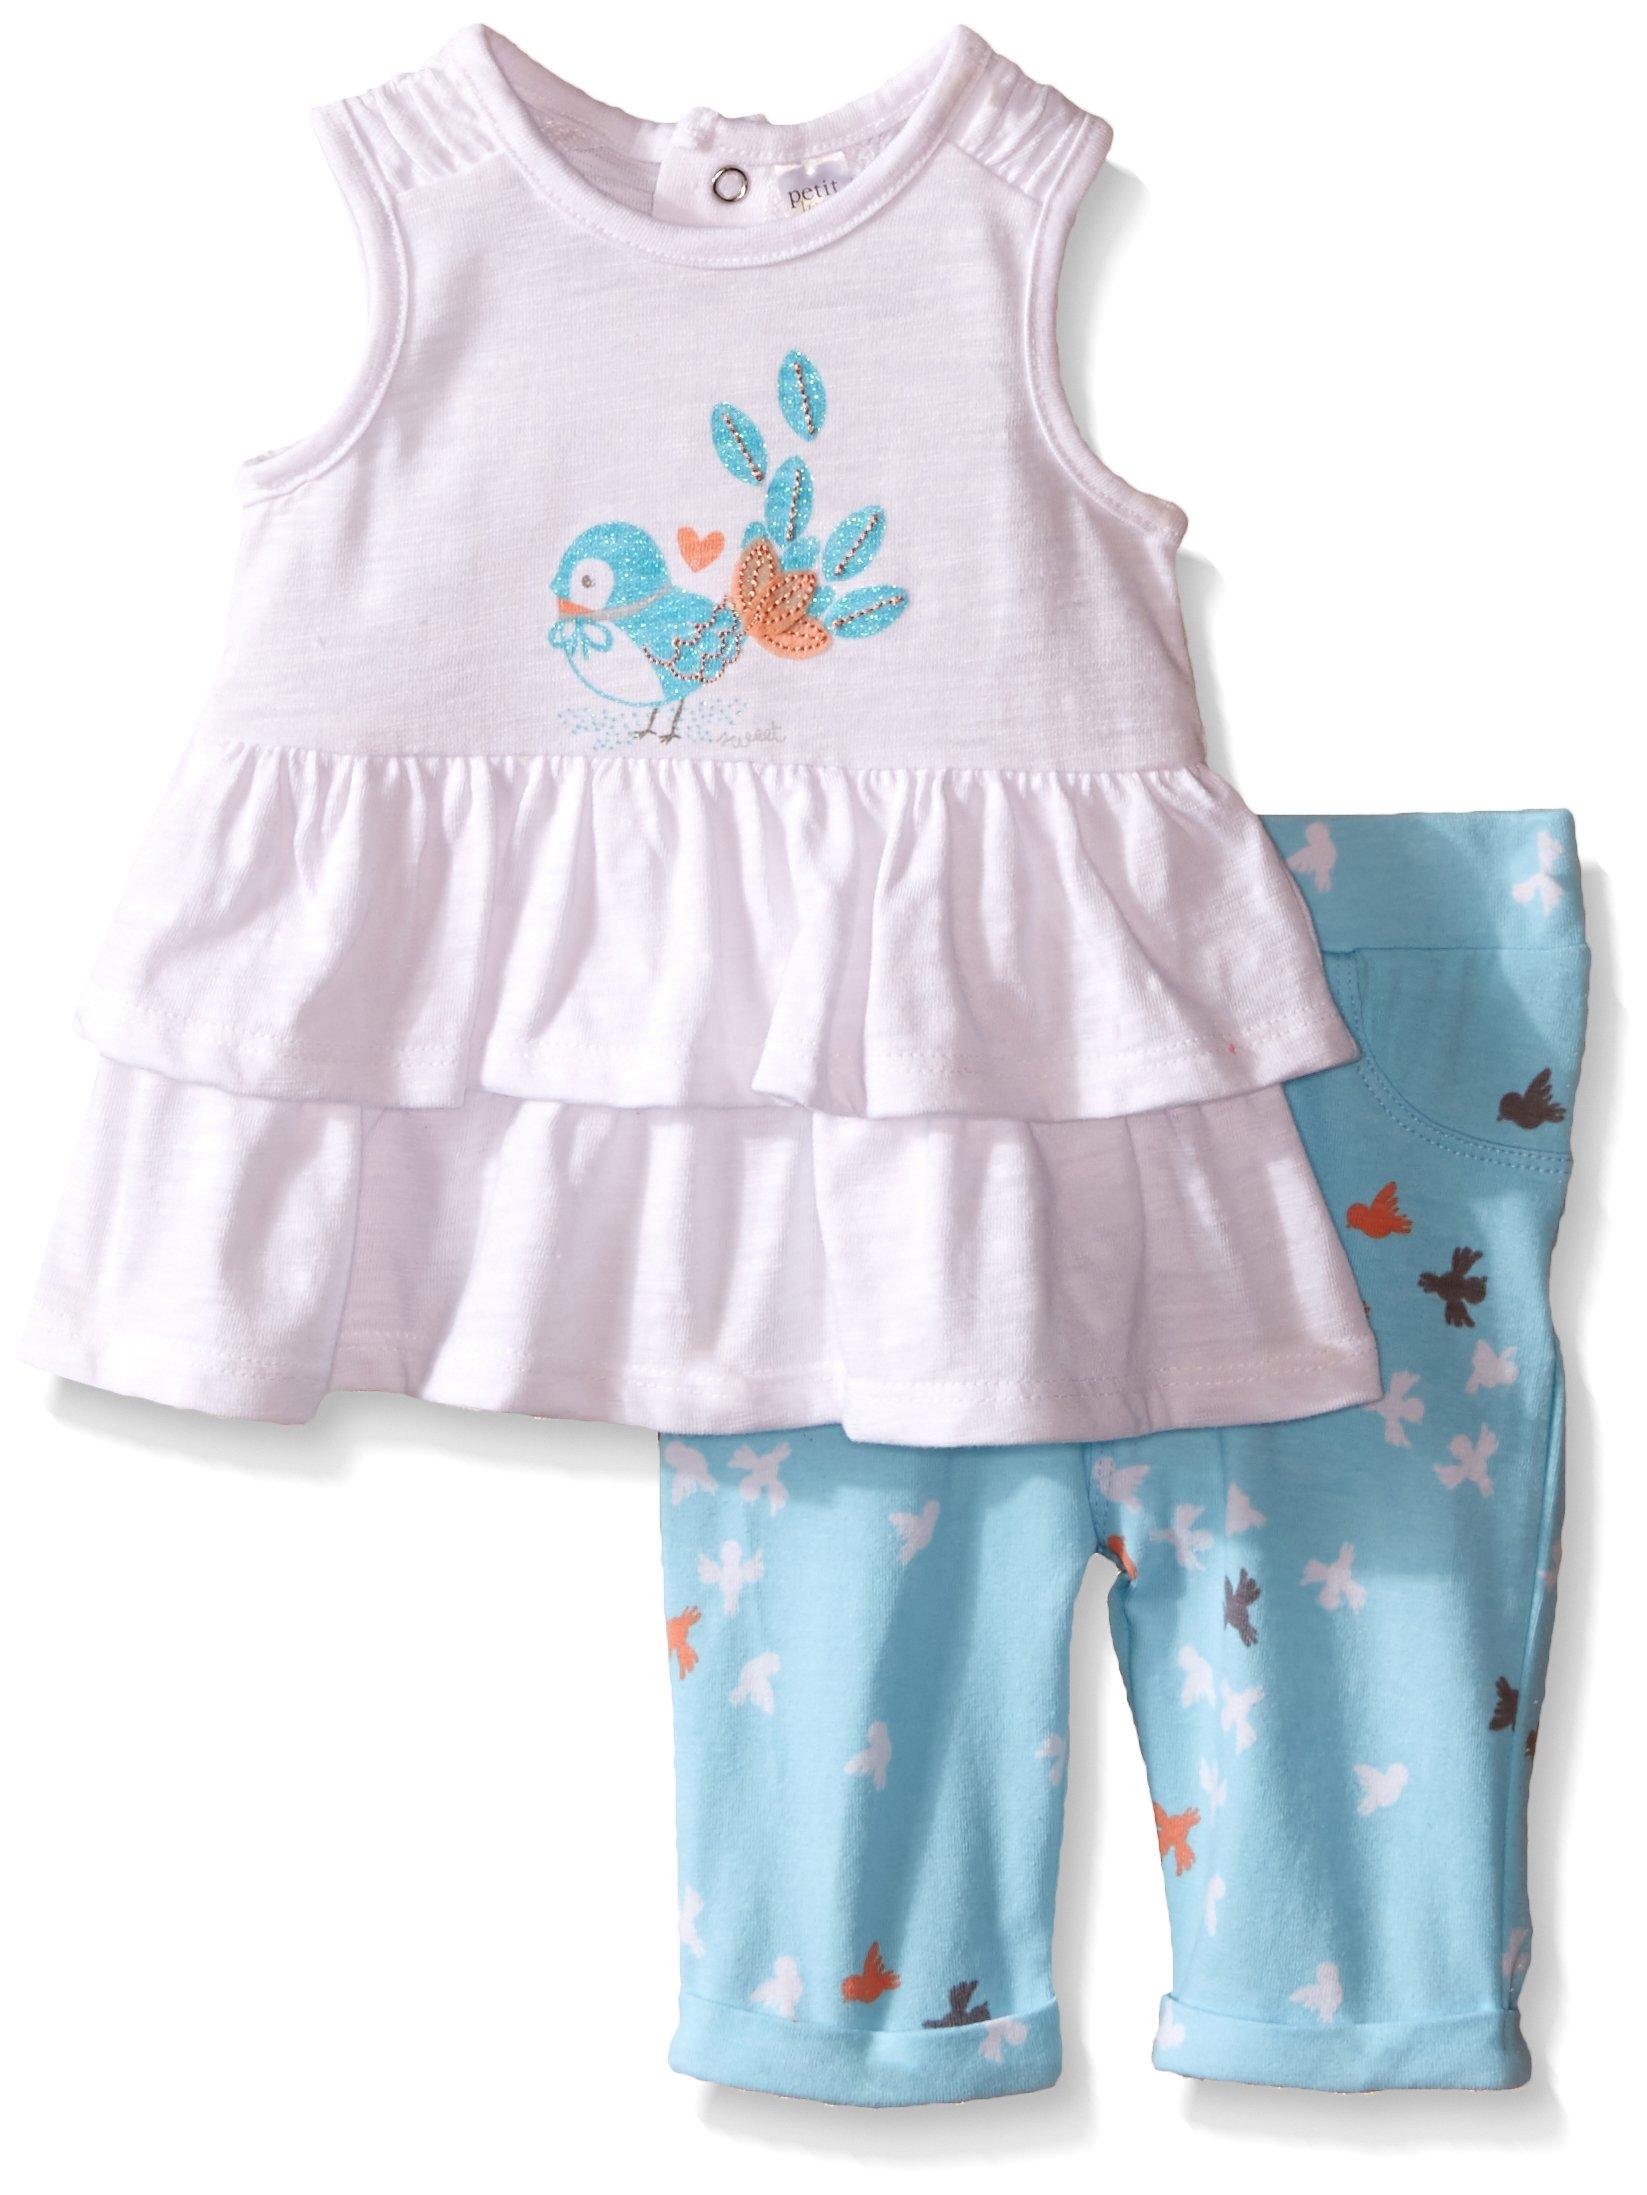 Petit Lem Girls' Baby 2 Piece Set Top and Legging-White, 24 Months by Petit Lem